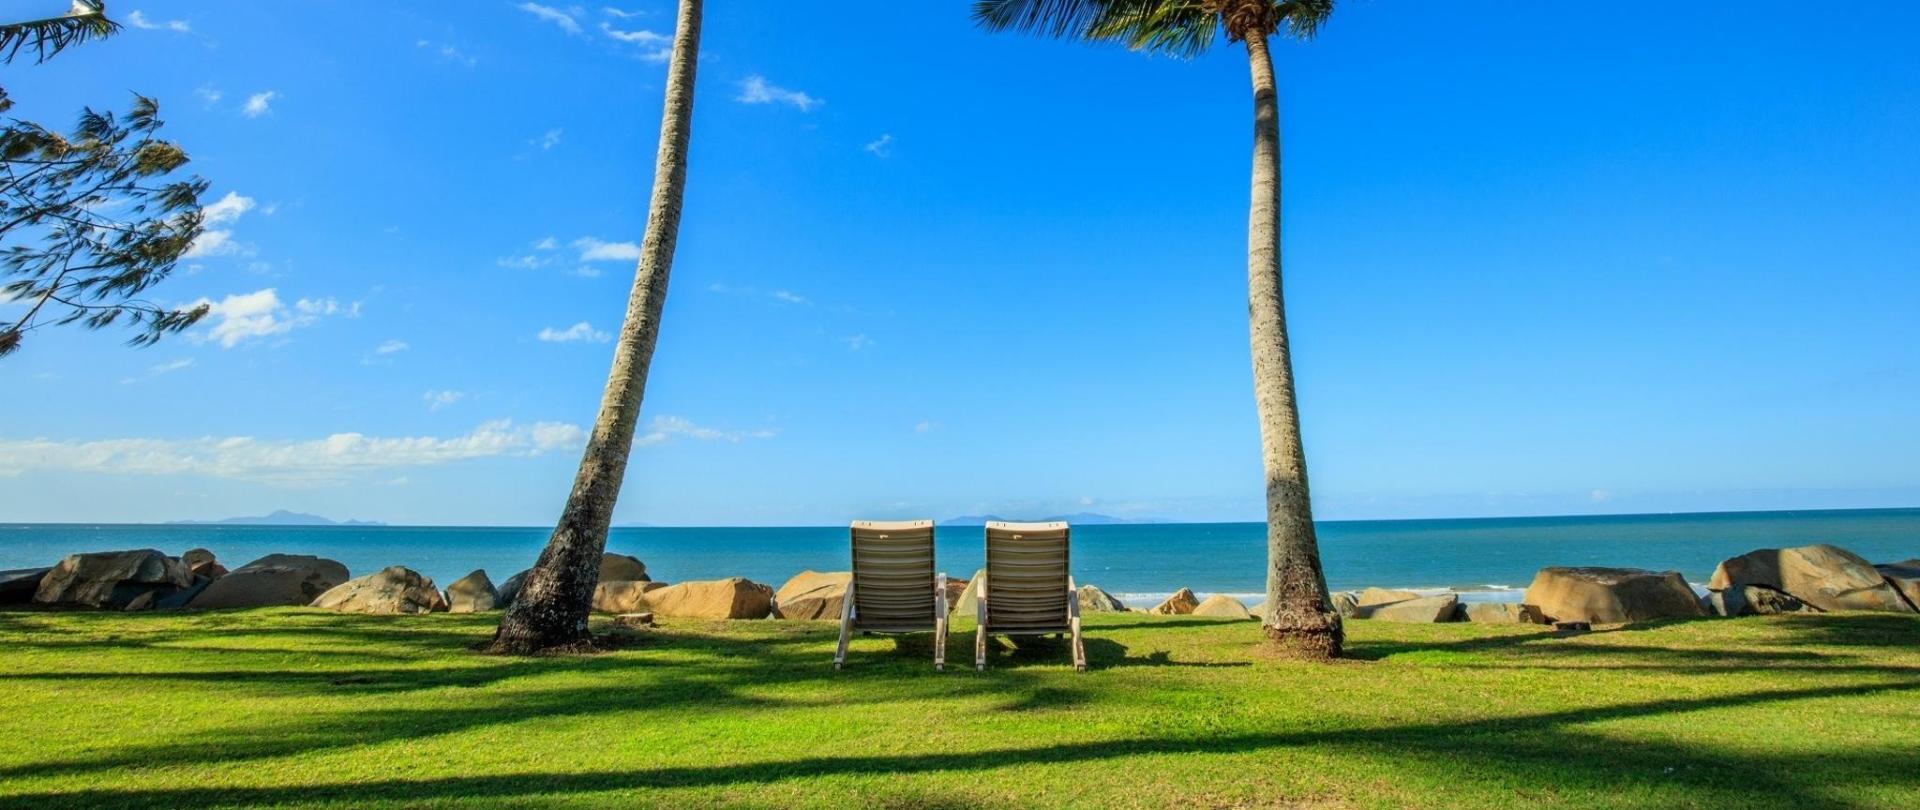 beach 2 seats.jpg